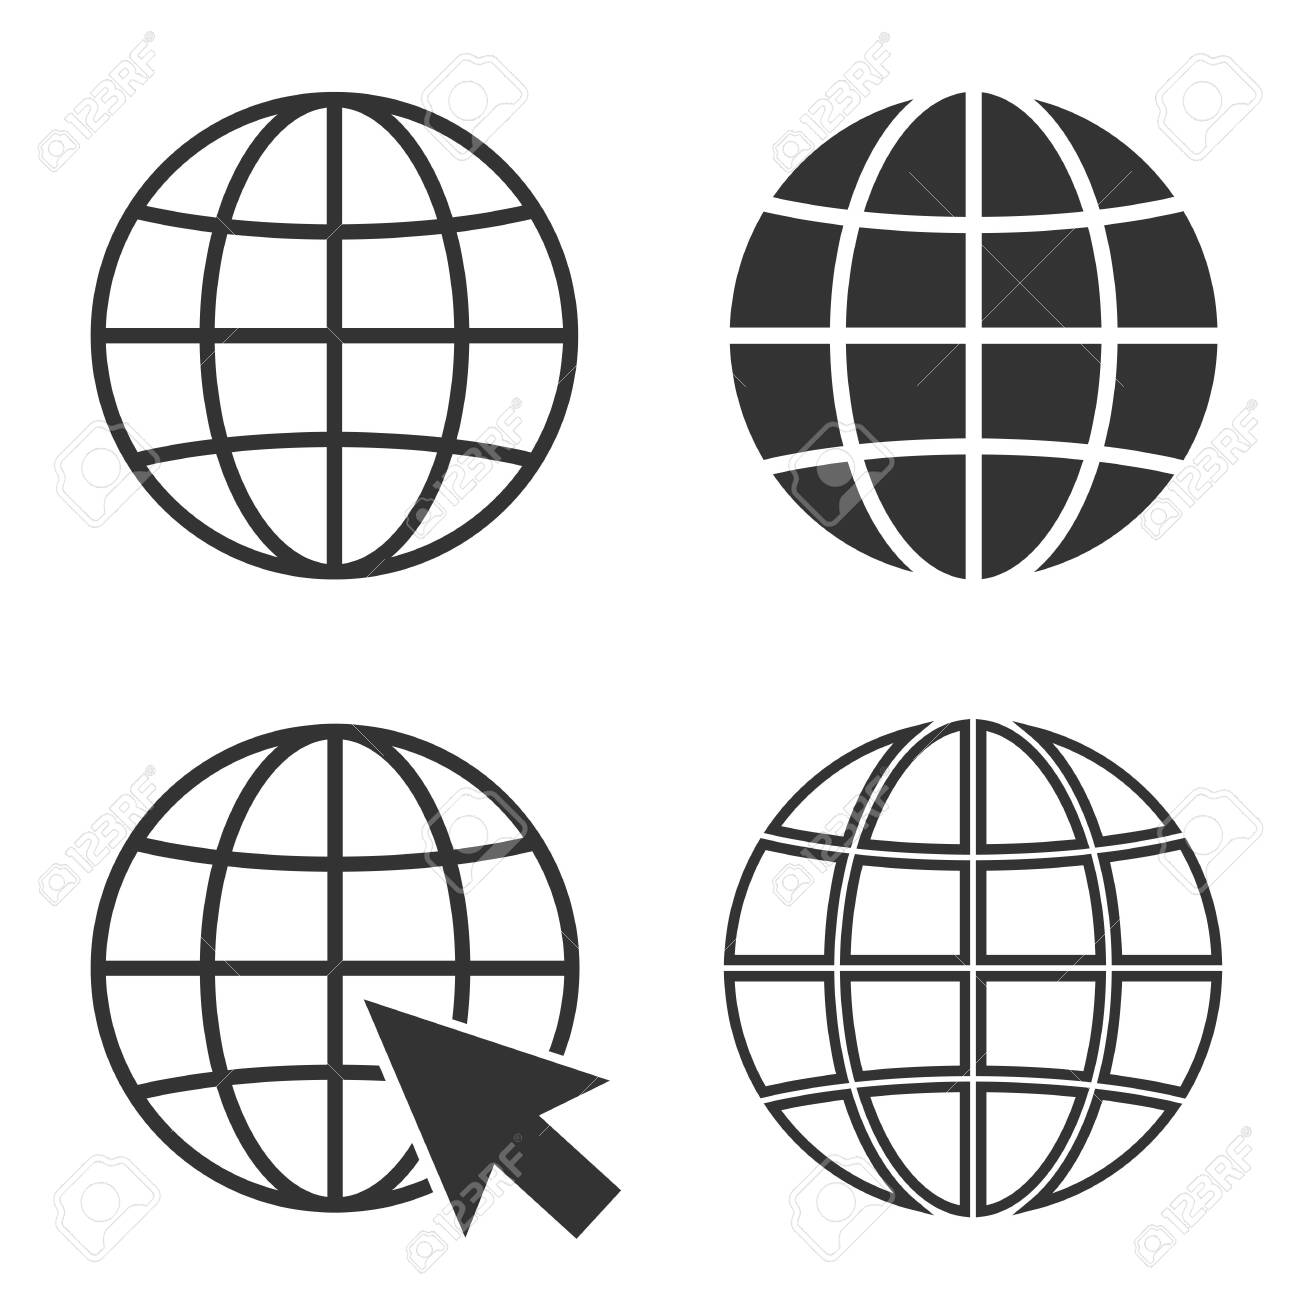 simple globe icon set and internet symbol vector illustration